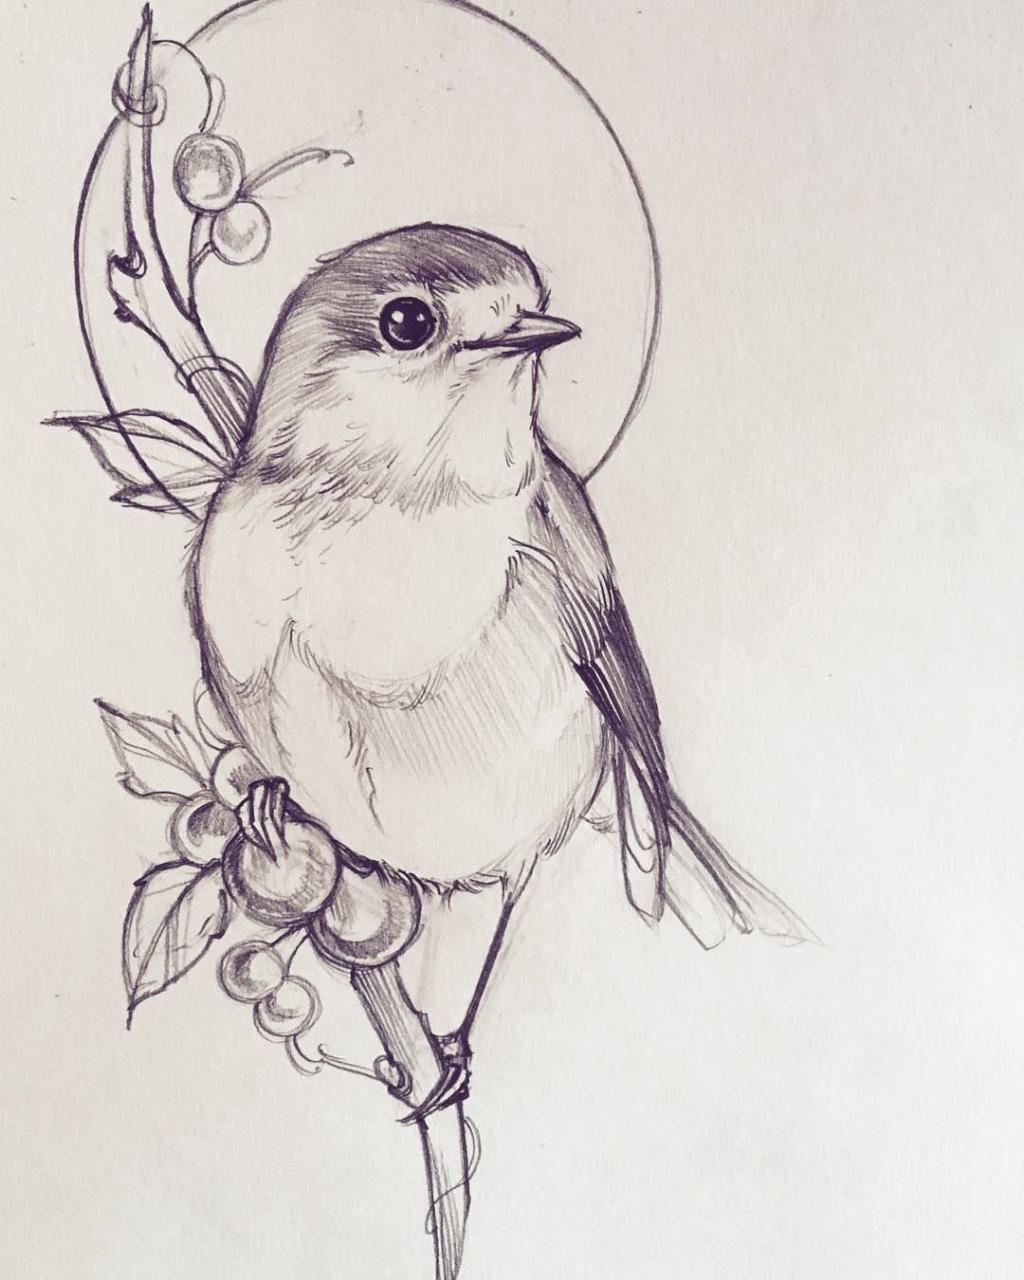 Pin By Yohan Marino On Tatuagem Coroa In 2020 Bird Drawings Bird Sketch Animal Sketches